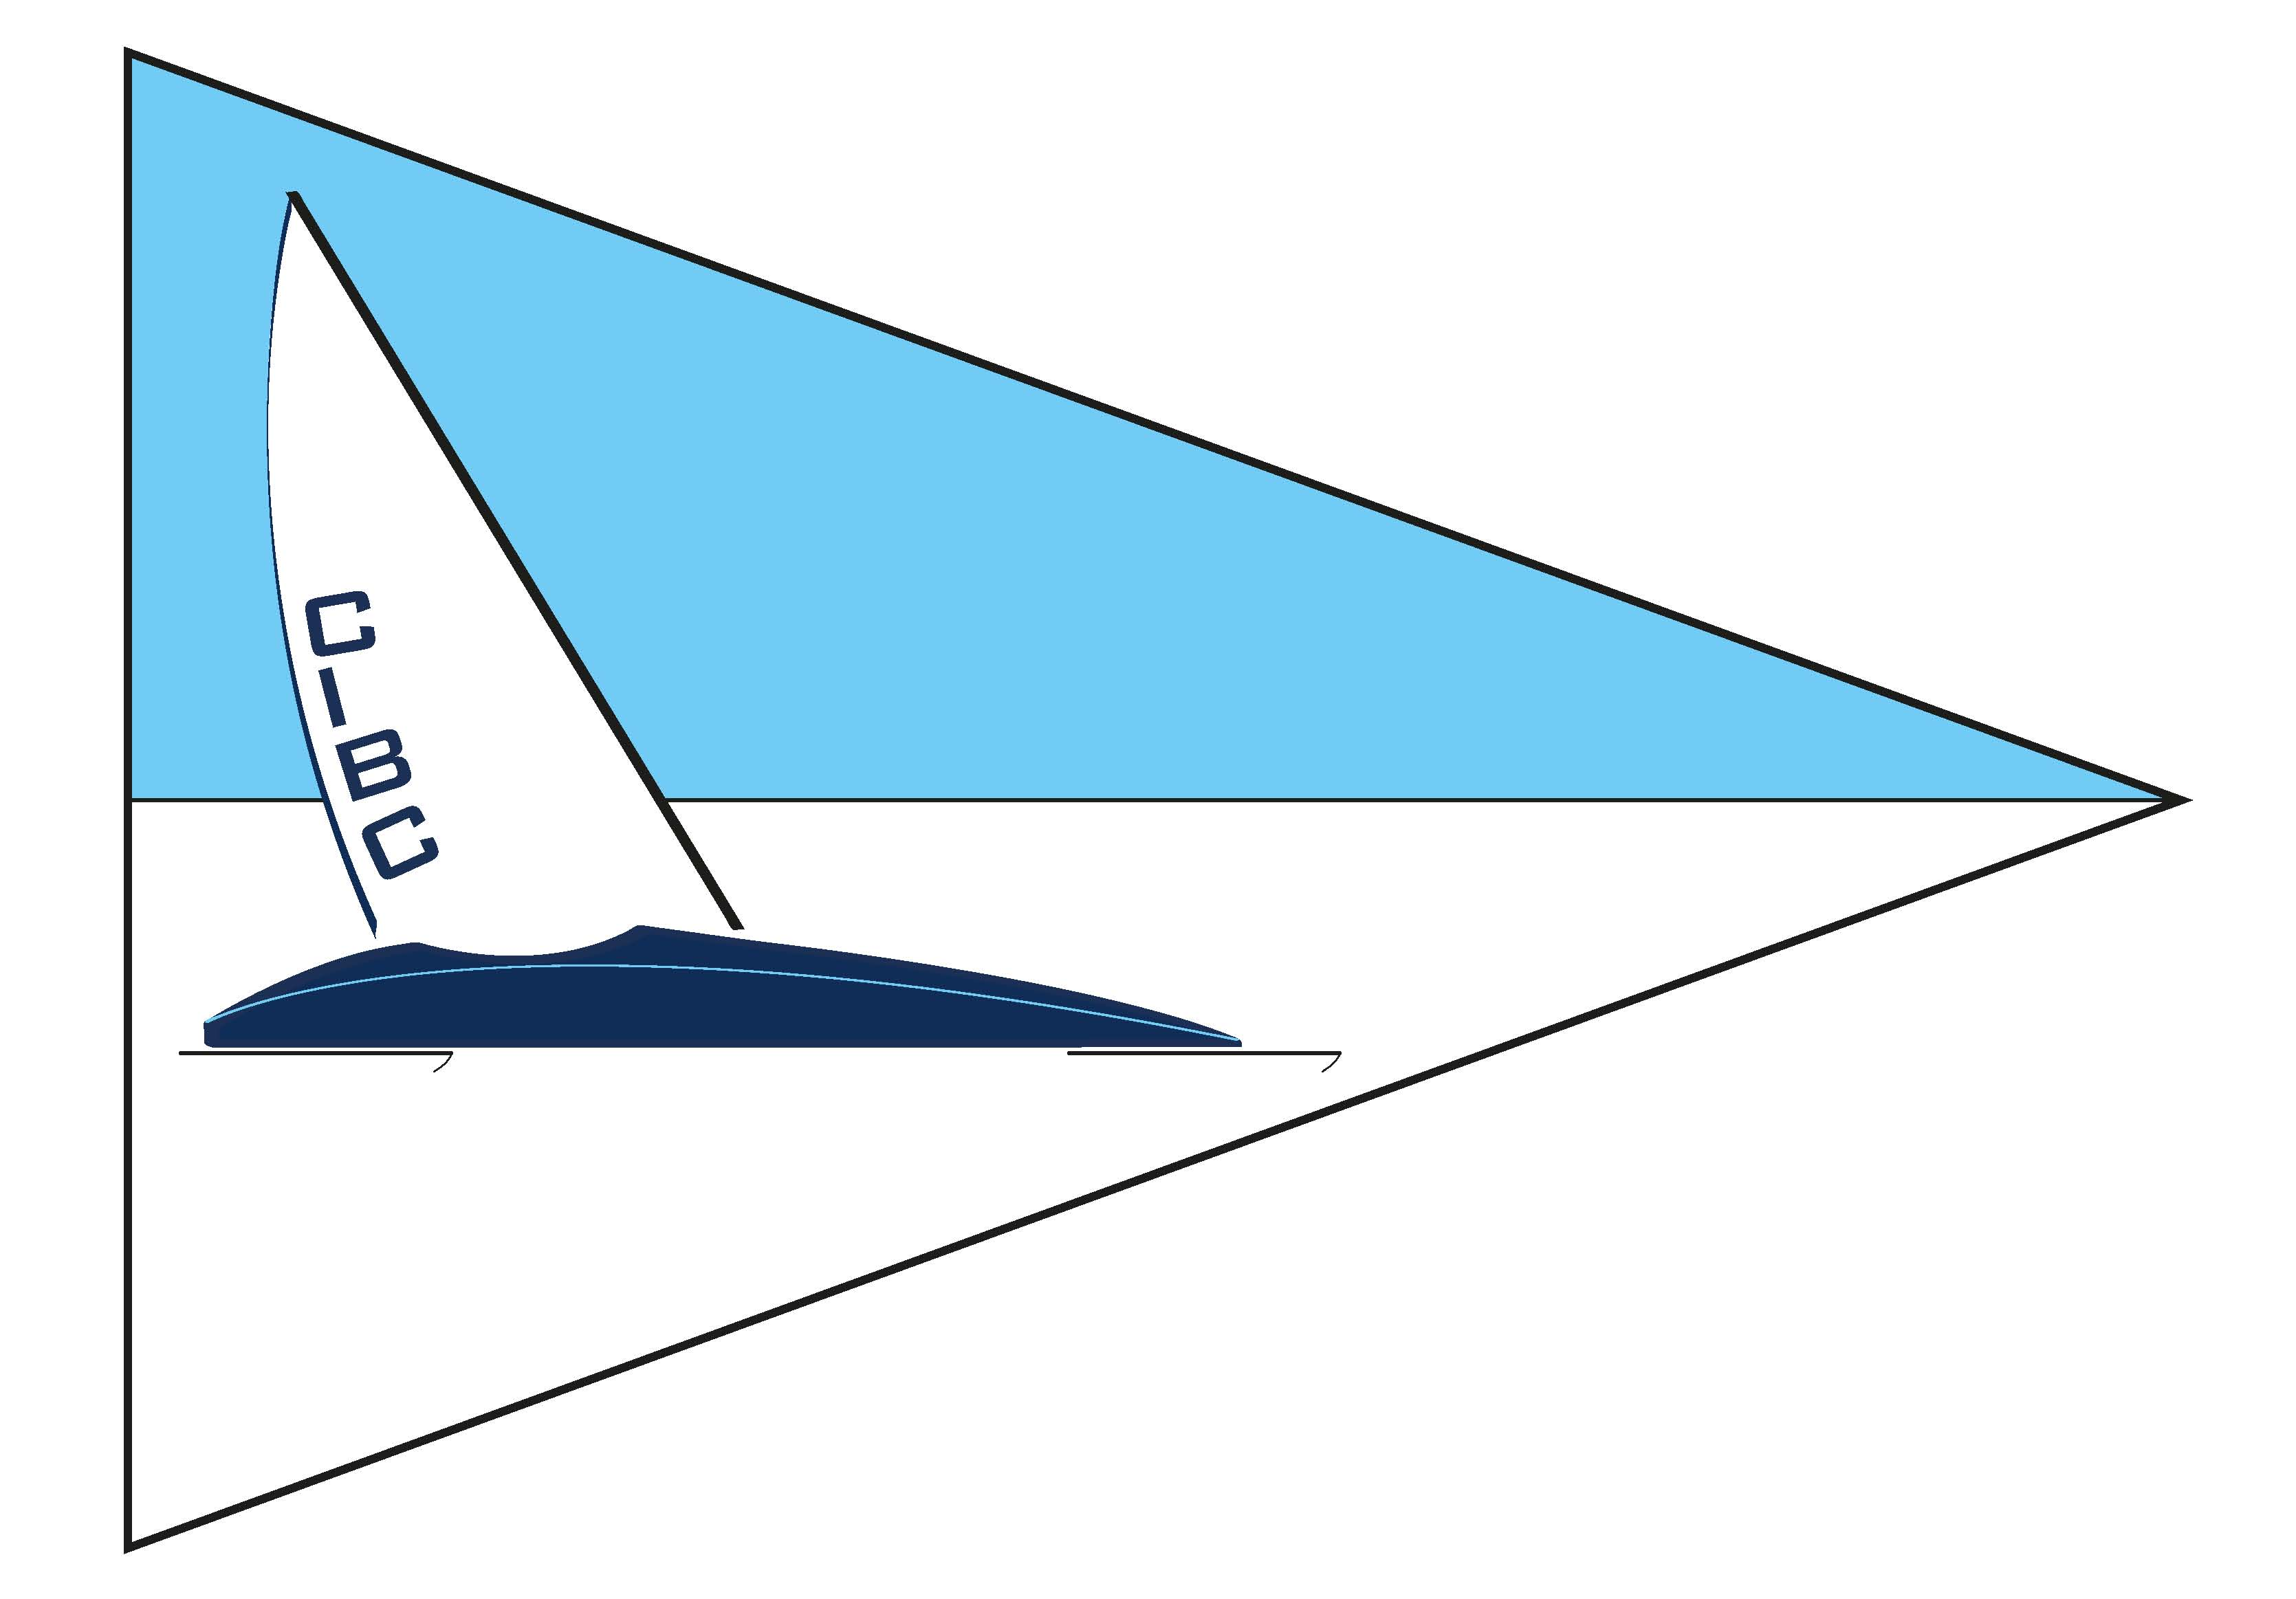 cibc-logo-final-nov-13.jpg